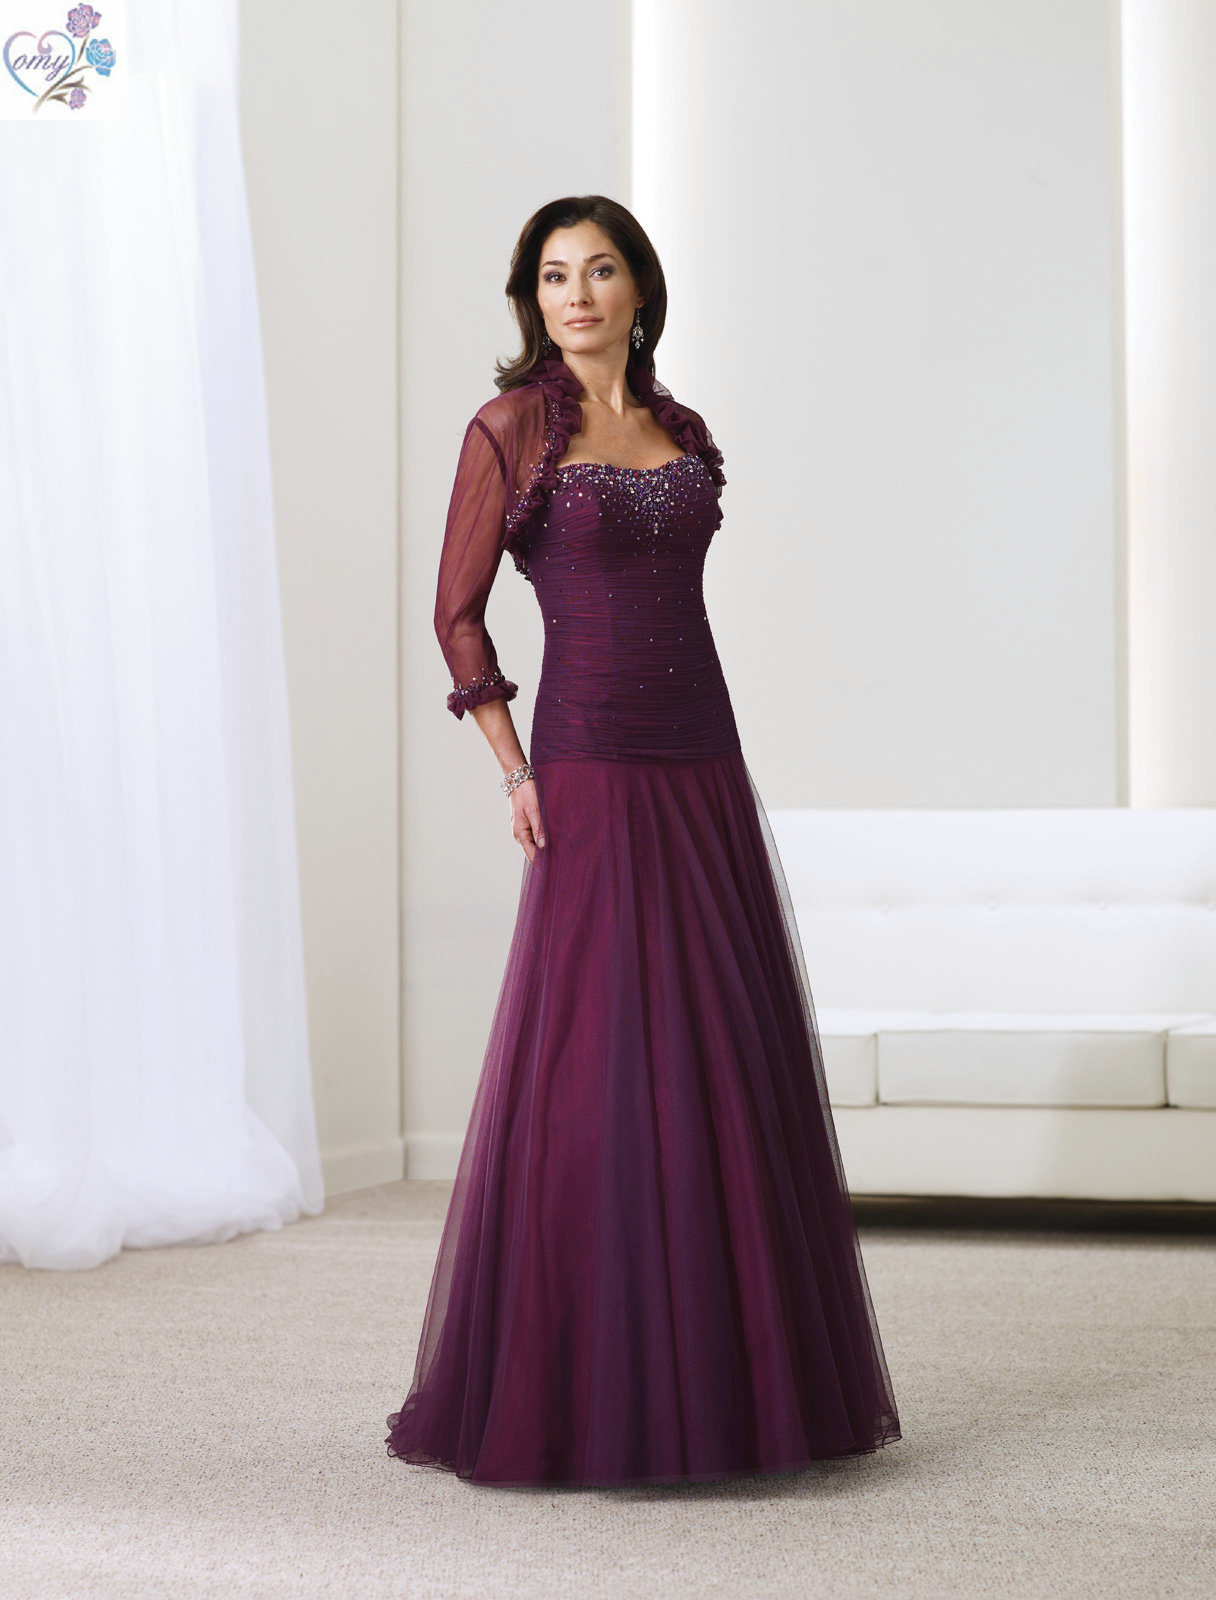 Purple Mother Of The Bride Dresses - High Cut Wedding Dresses